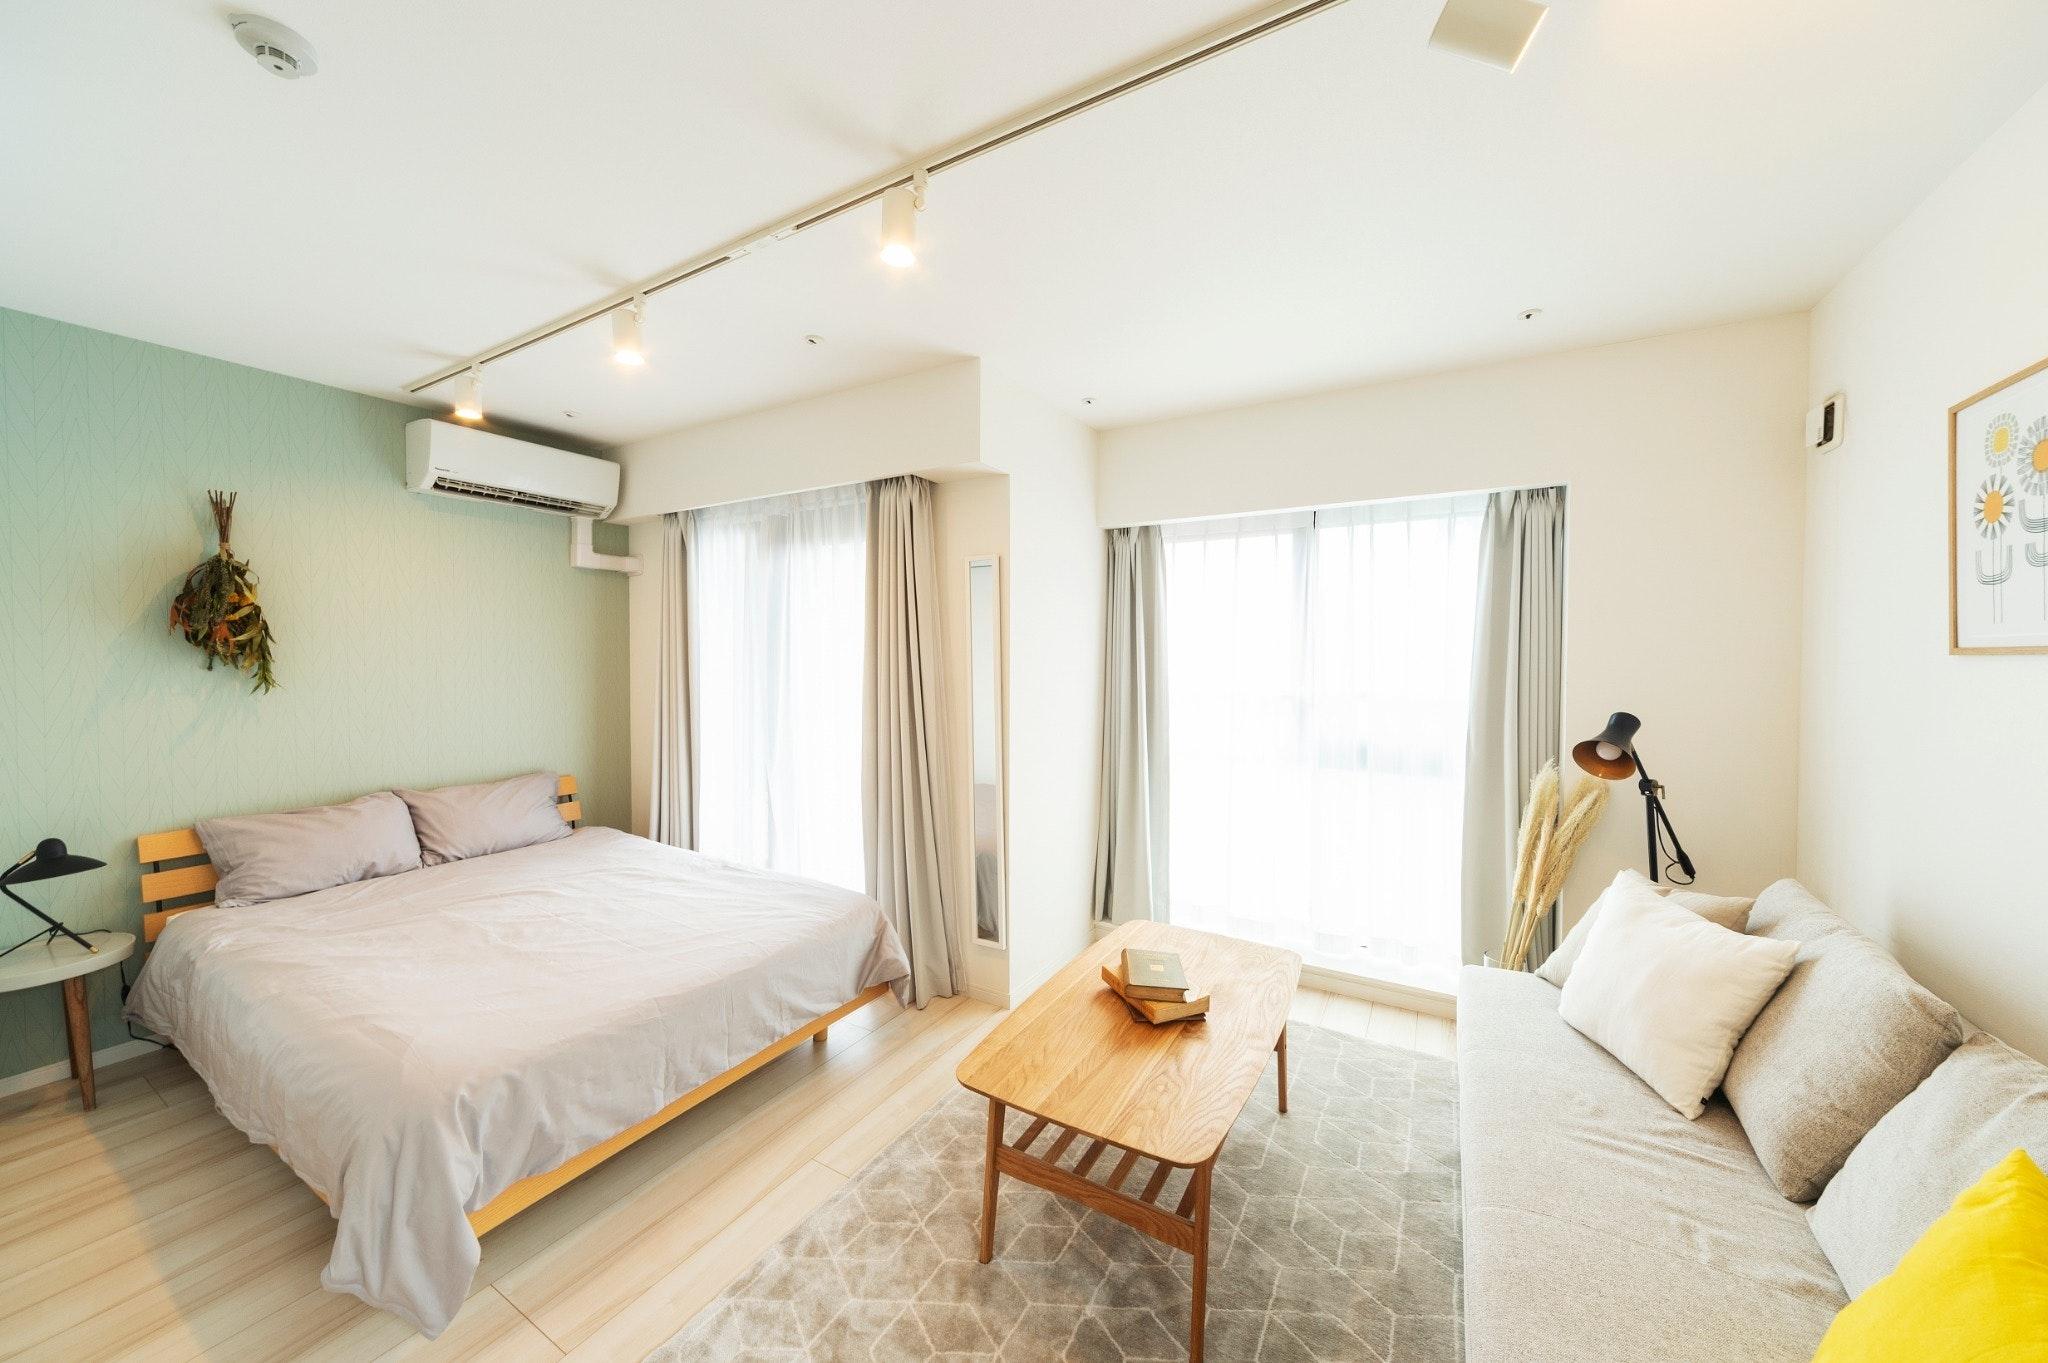 GH401*東中野駅、落合駅徒歩4分、キッチン、洗濯機付きの30平米1Kの住居型ホテル